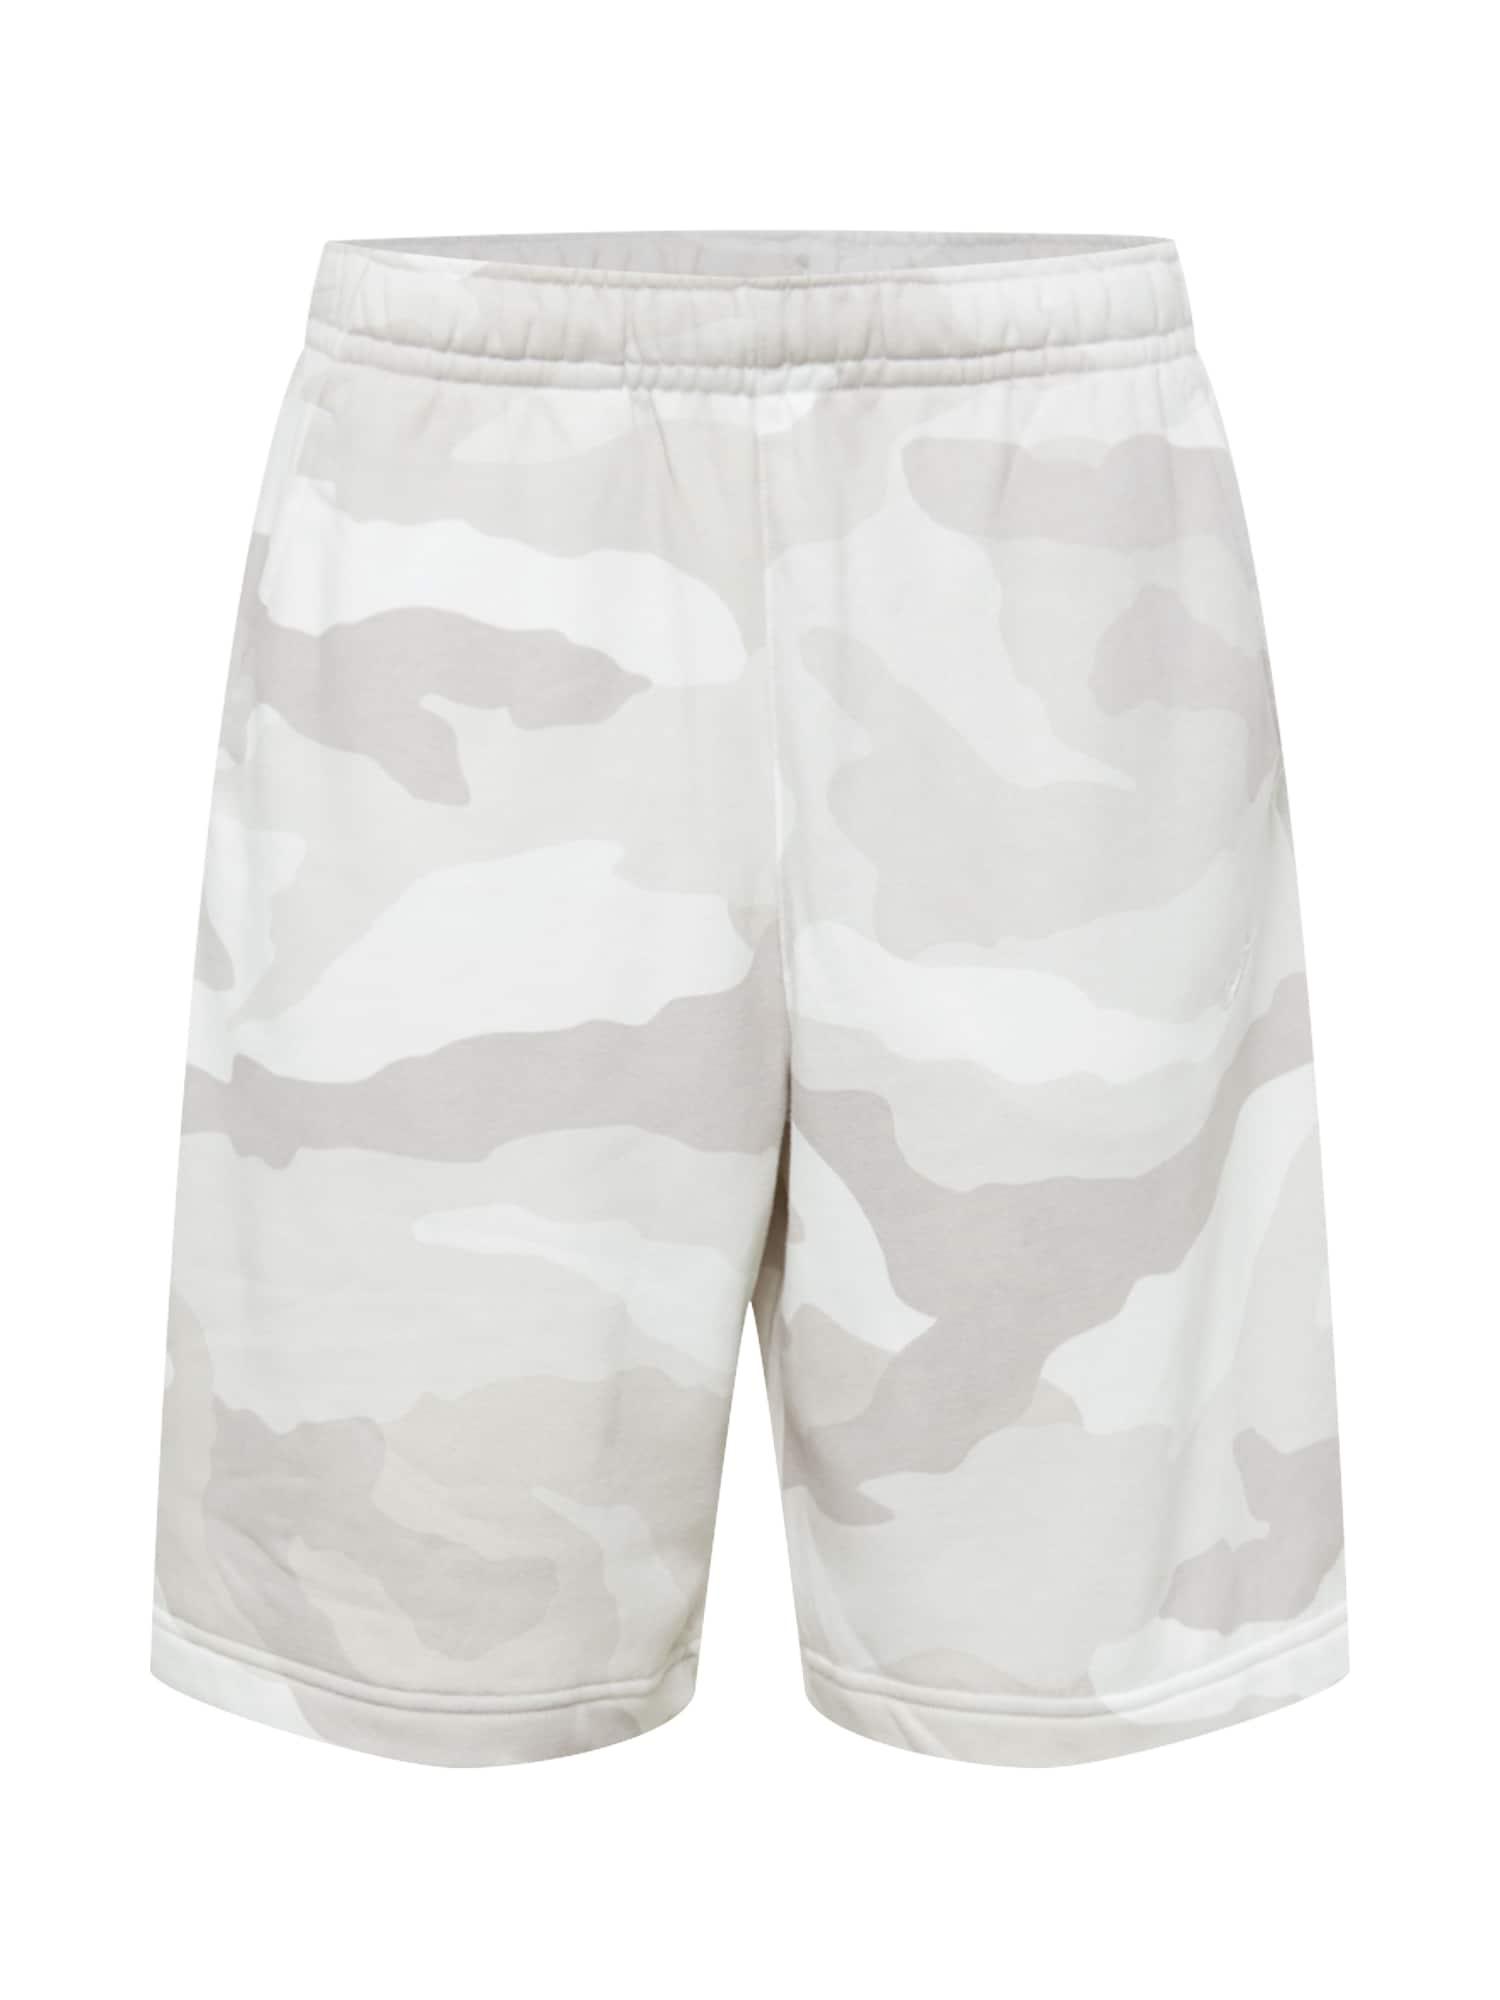 Nike Sportswear Kelnės balta / šviesiai pilka / pilka